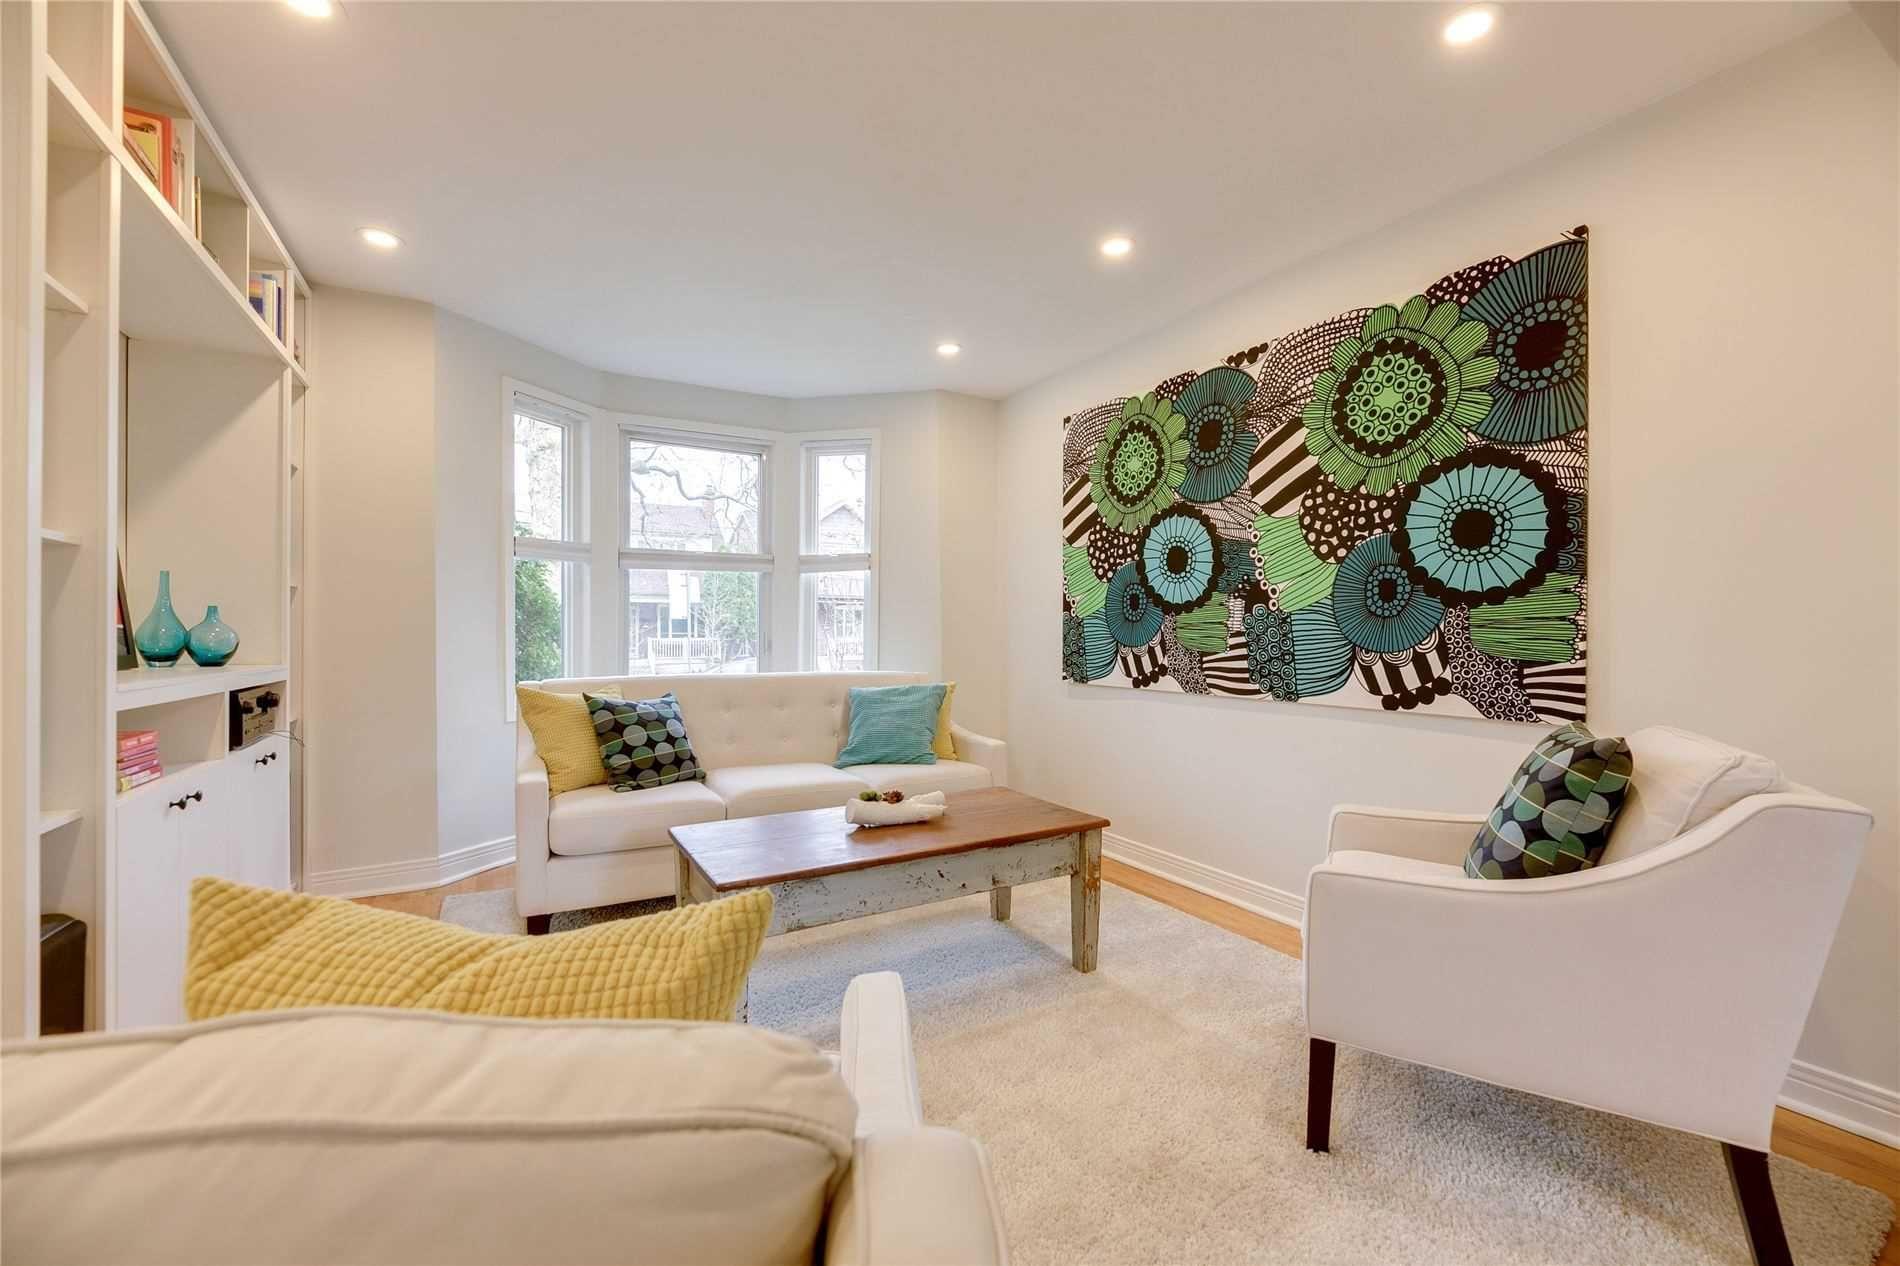 Main Photo: 246 Strathmore Boulevard in Toronto: Danforth House (2-Storey) for sale (Toronto E03)  : MLS®# E5219540